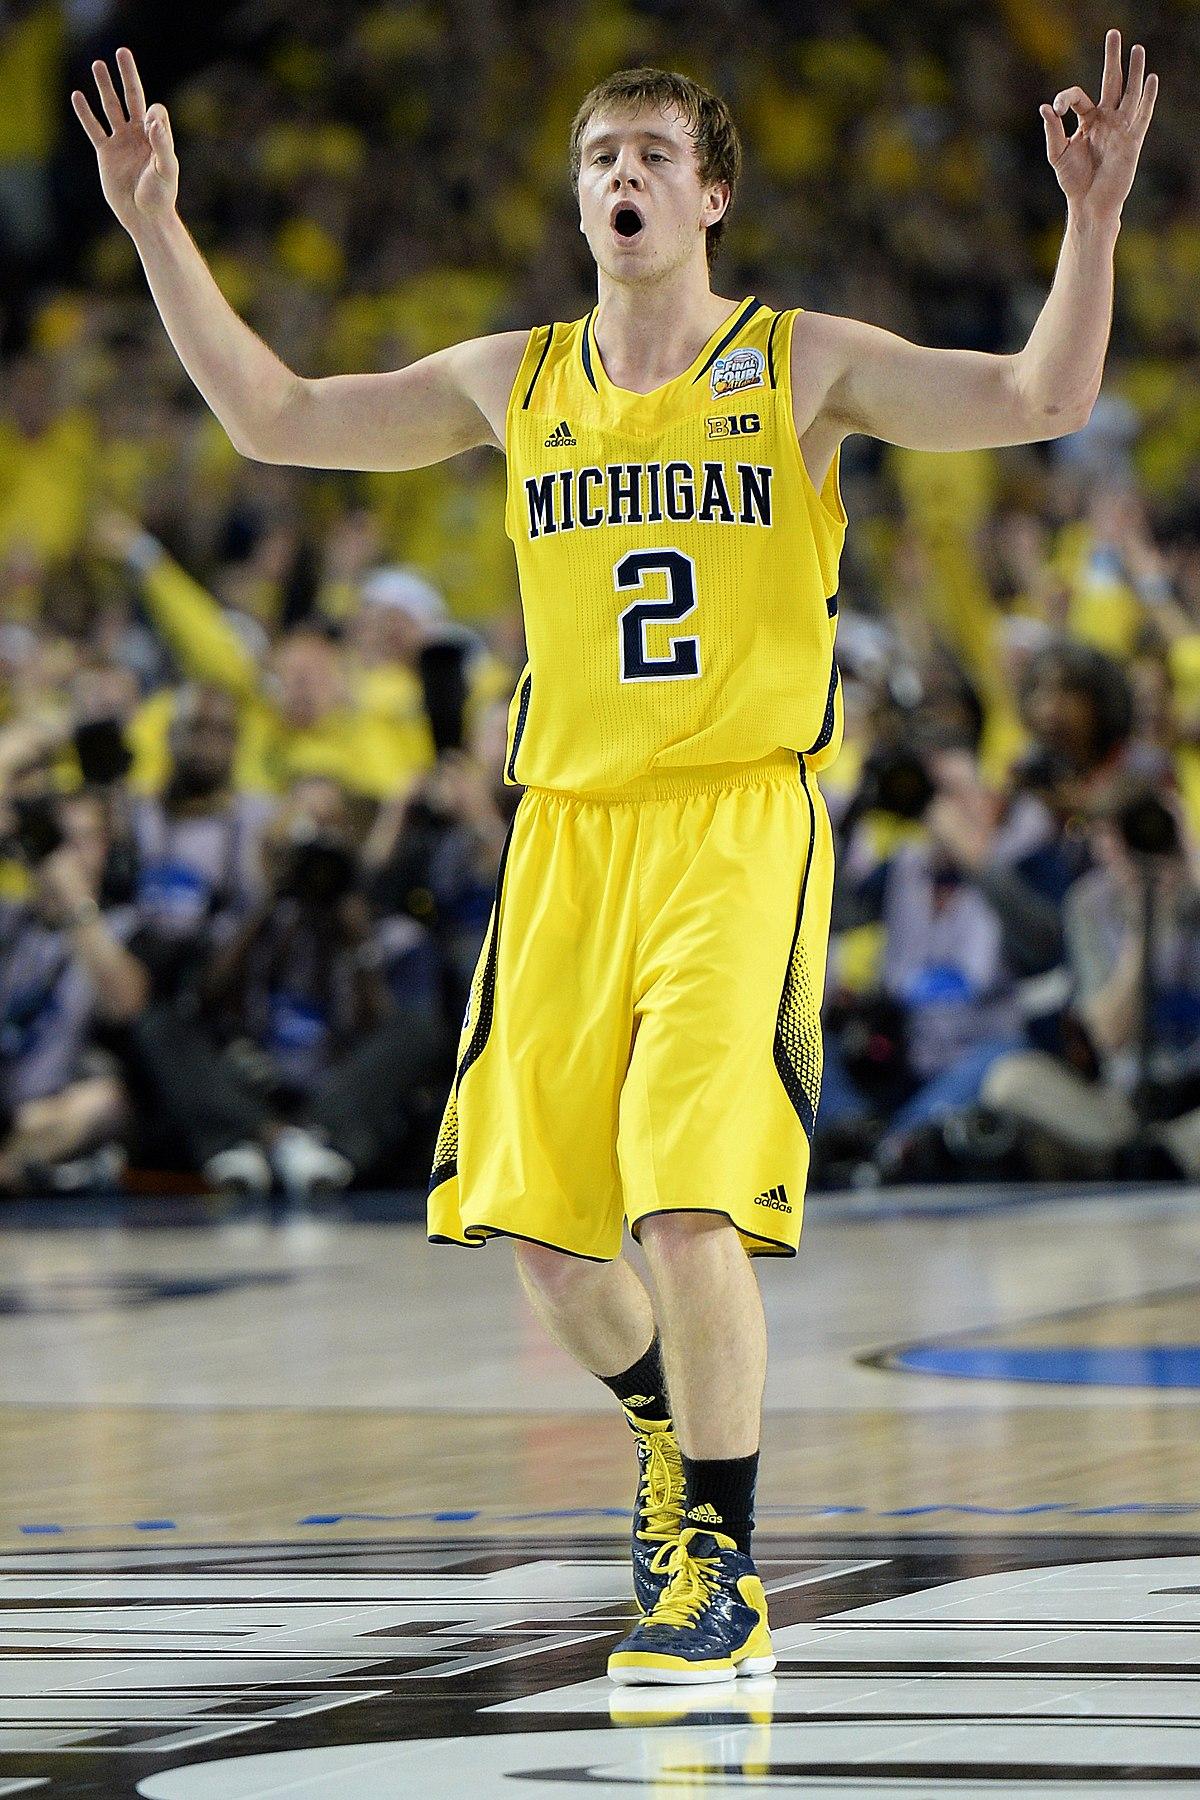 2013 NCAA Division I Men's Basketball Championship Game - Wikipedia